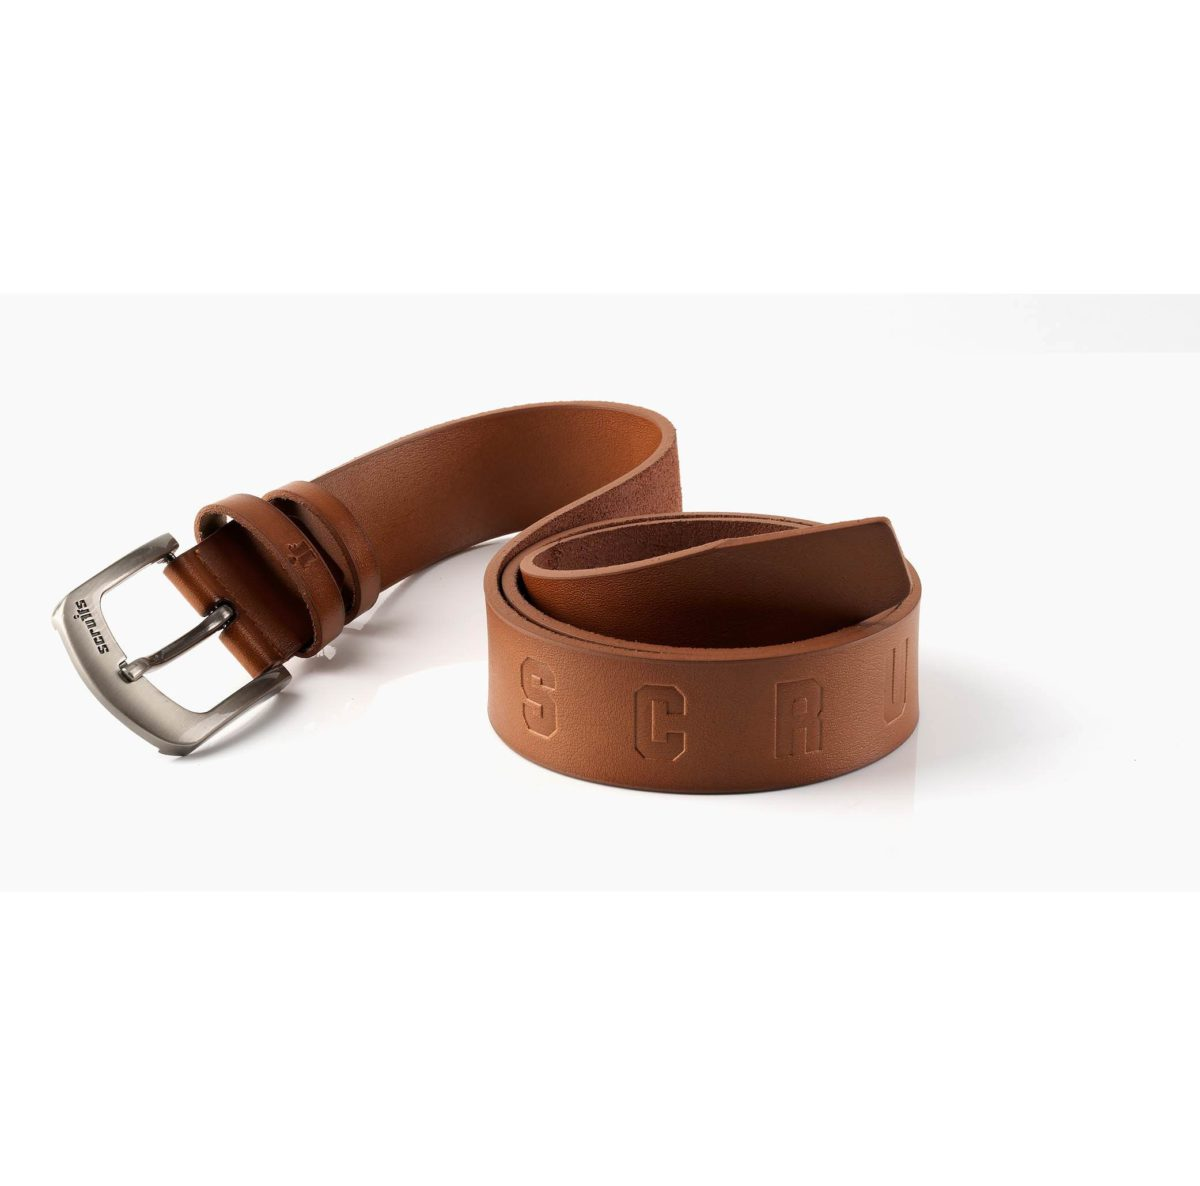 Scruffs Vintage Leather Belt XL